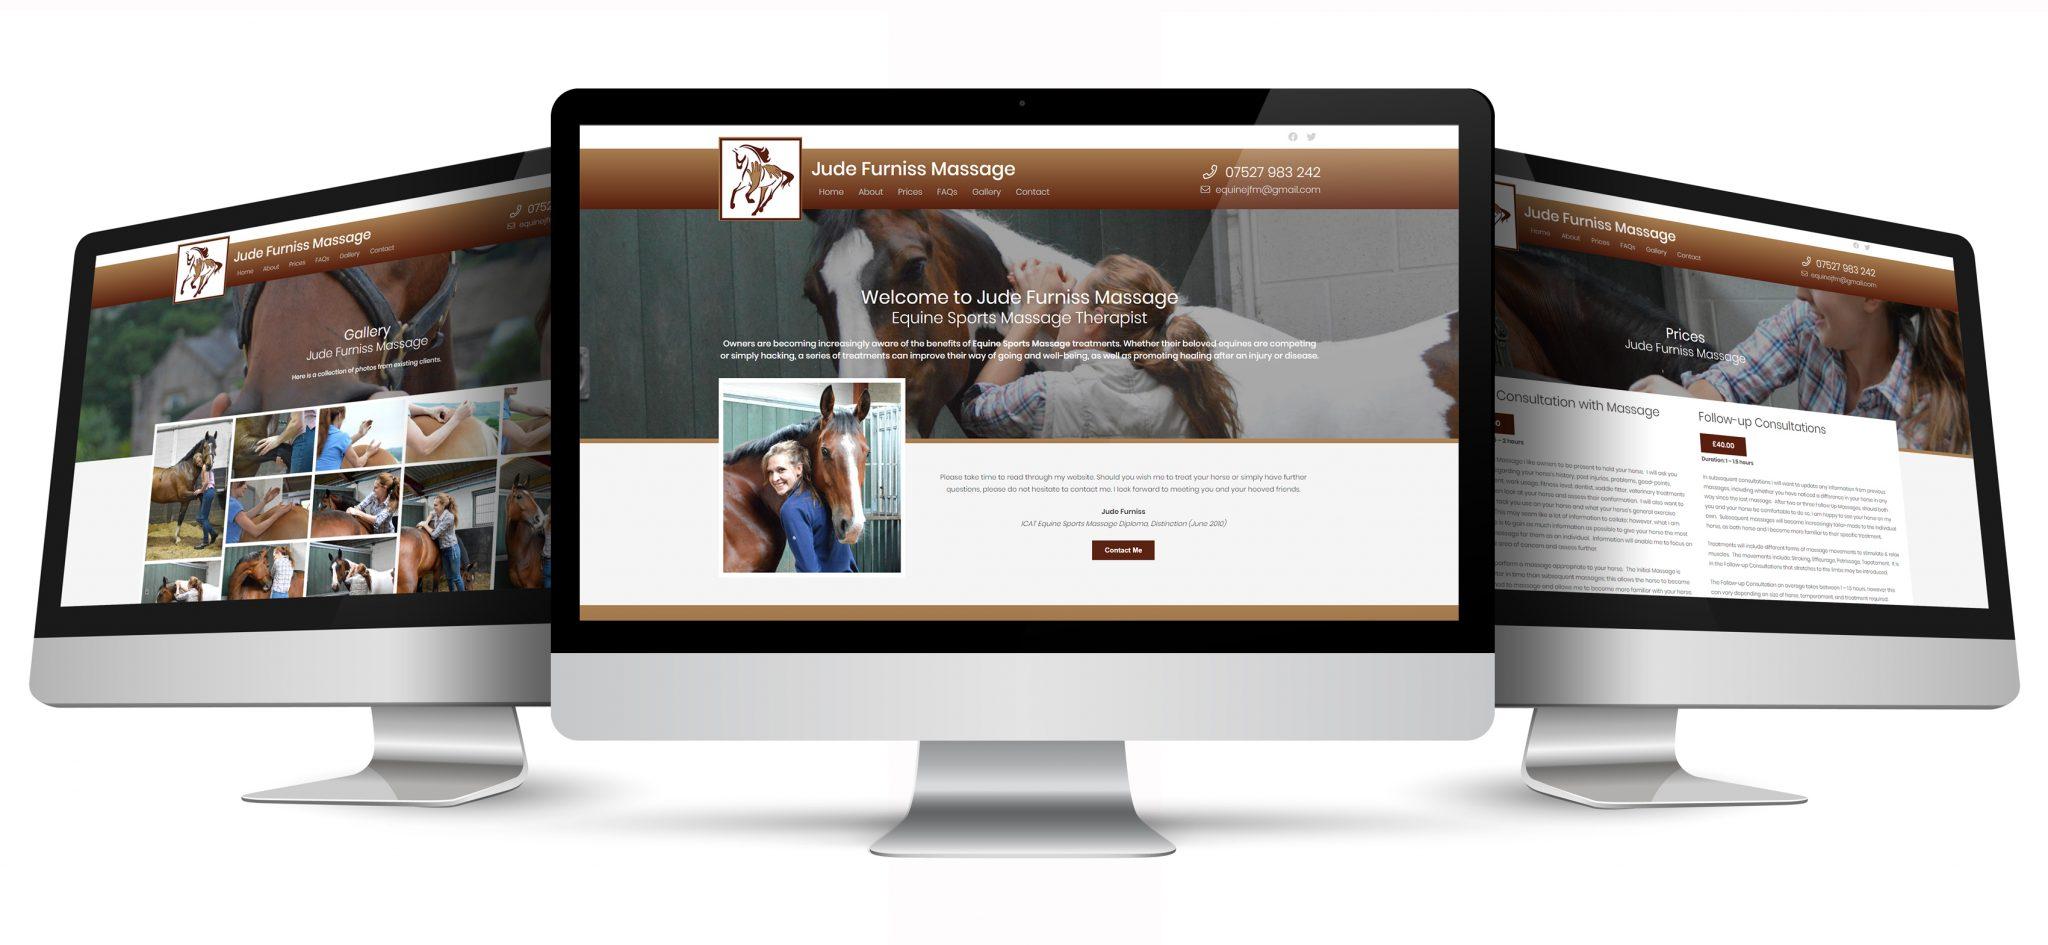 jude furniss massage website pages